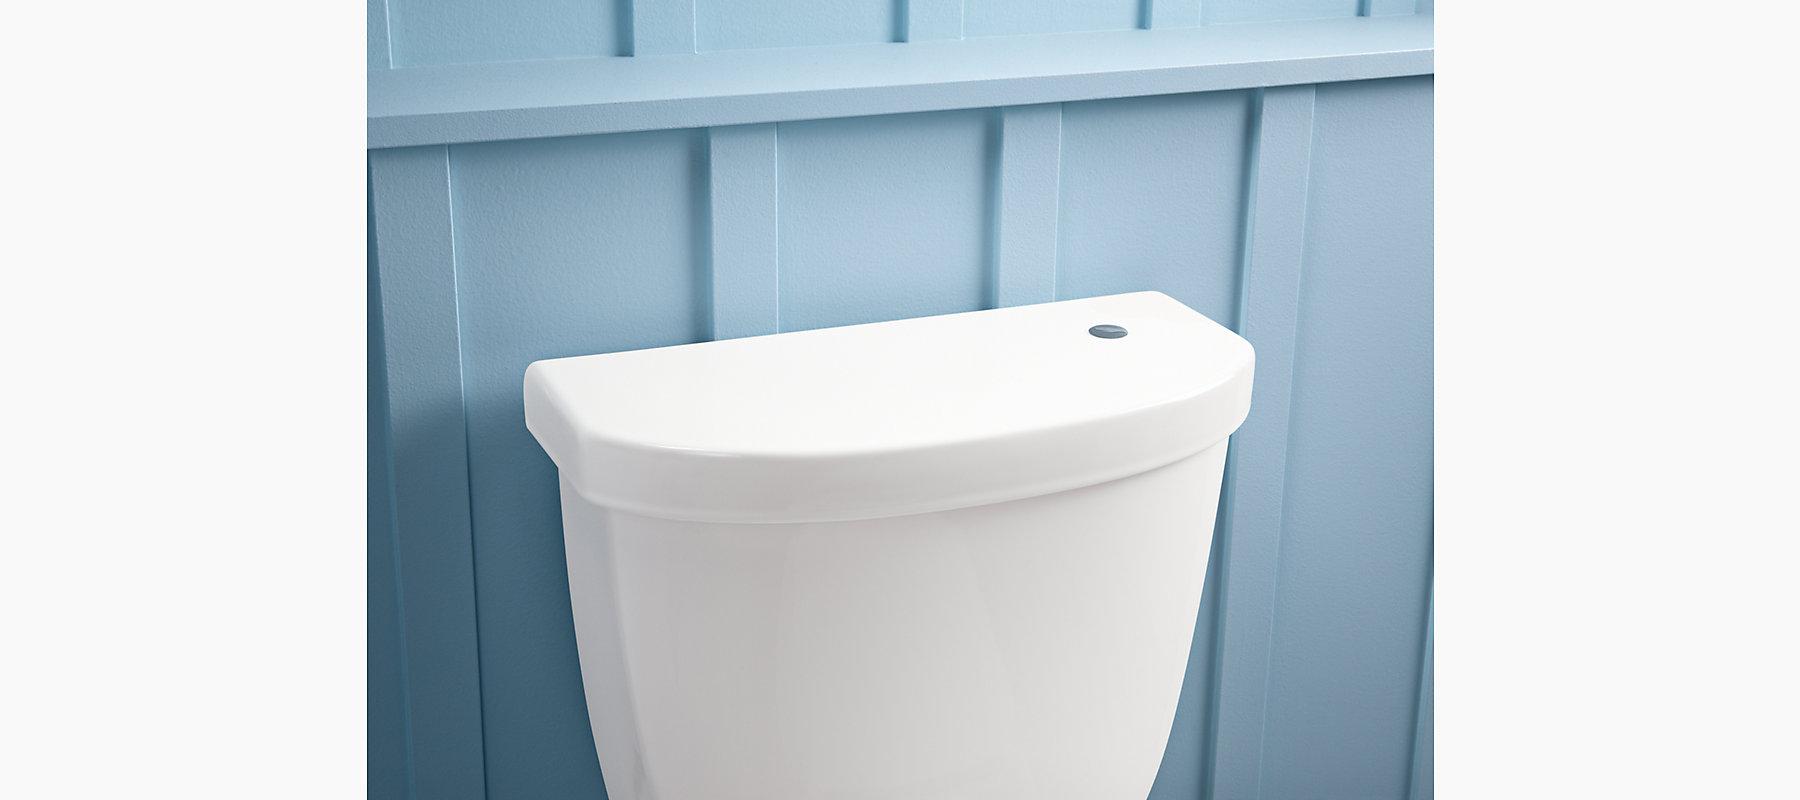 Cimarron Round-Front Touchless Toilet, 1.28 GPF | K-99250 | KOHLER